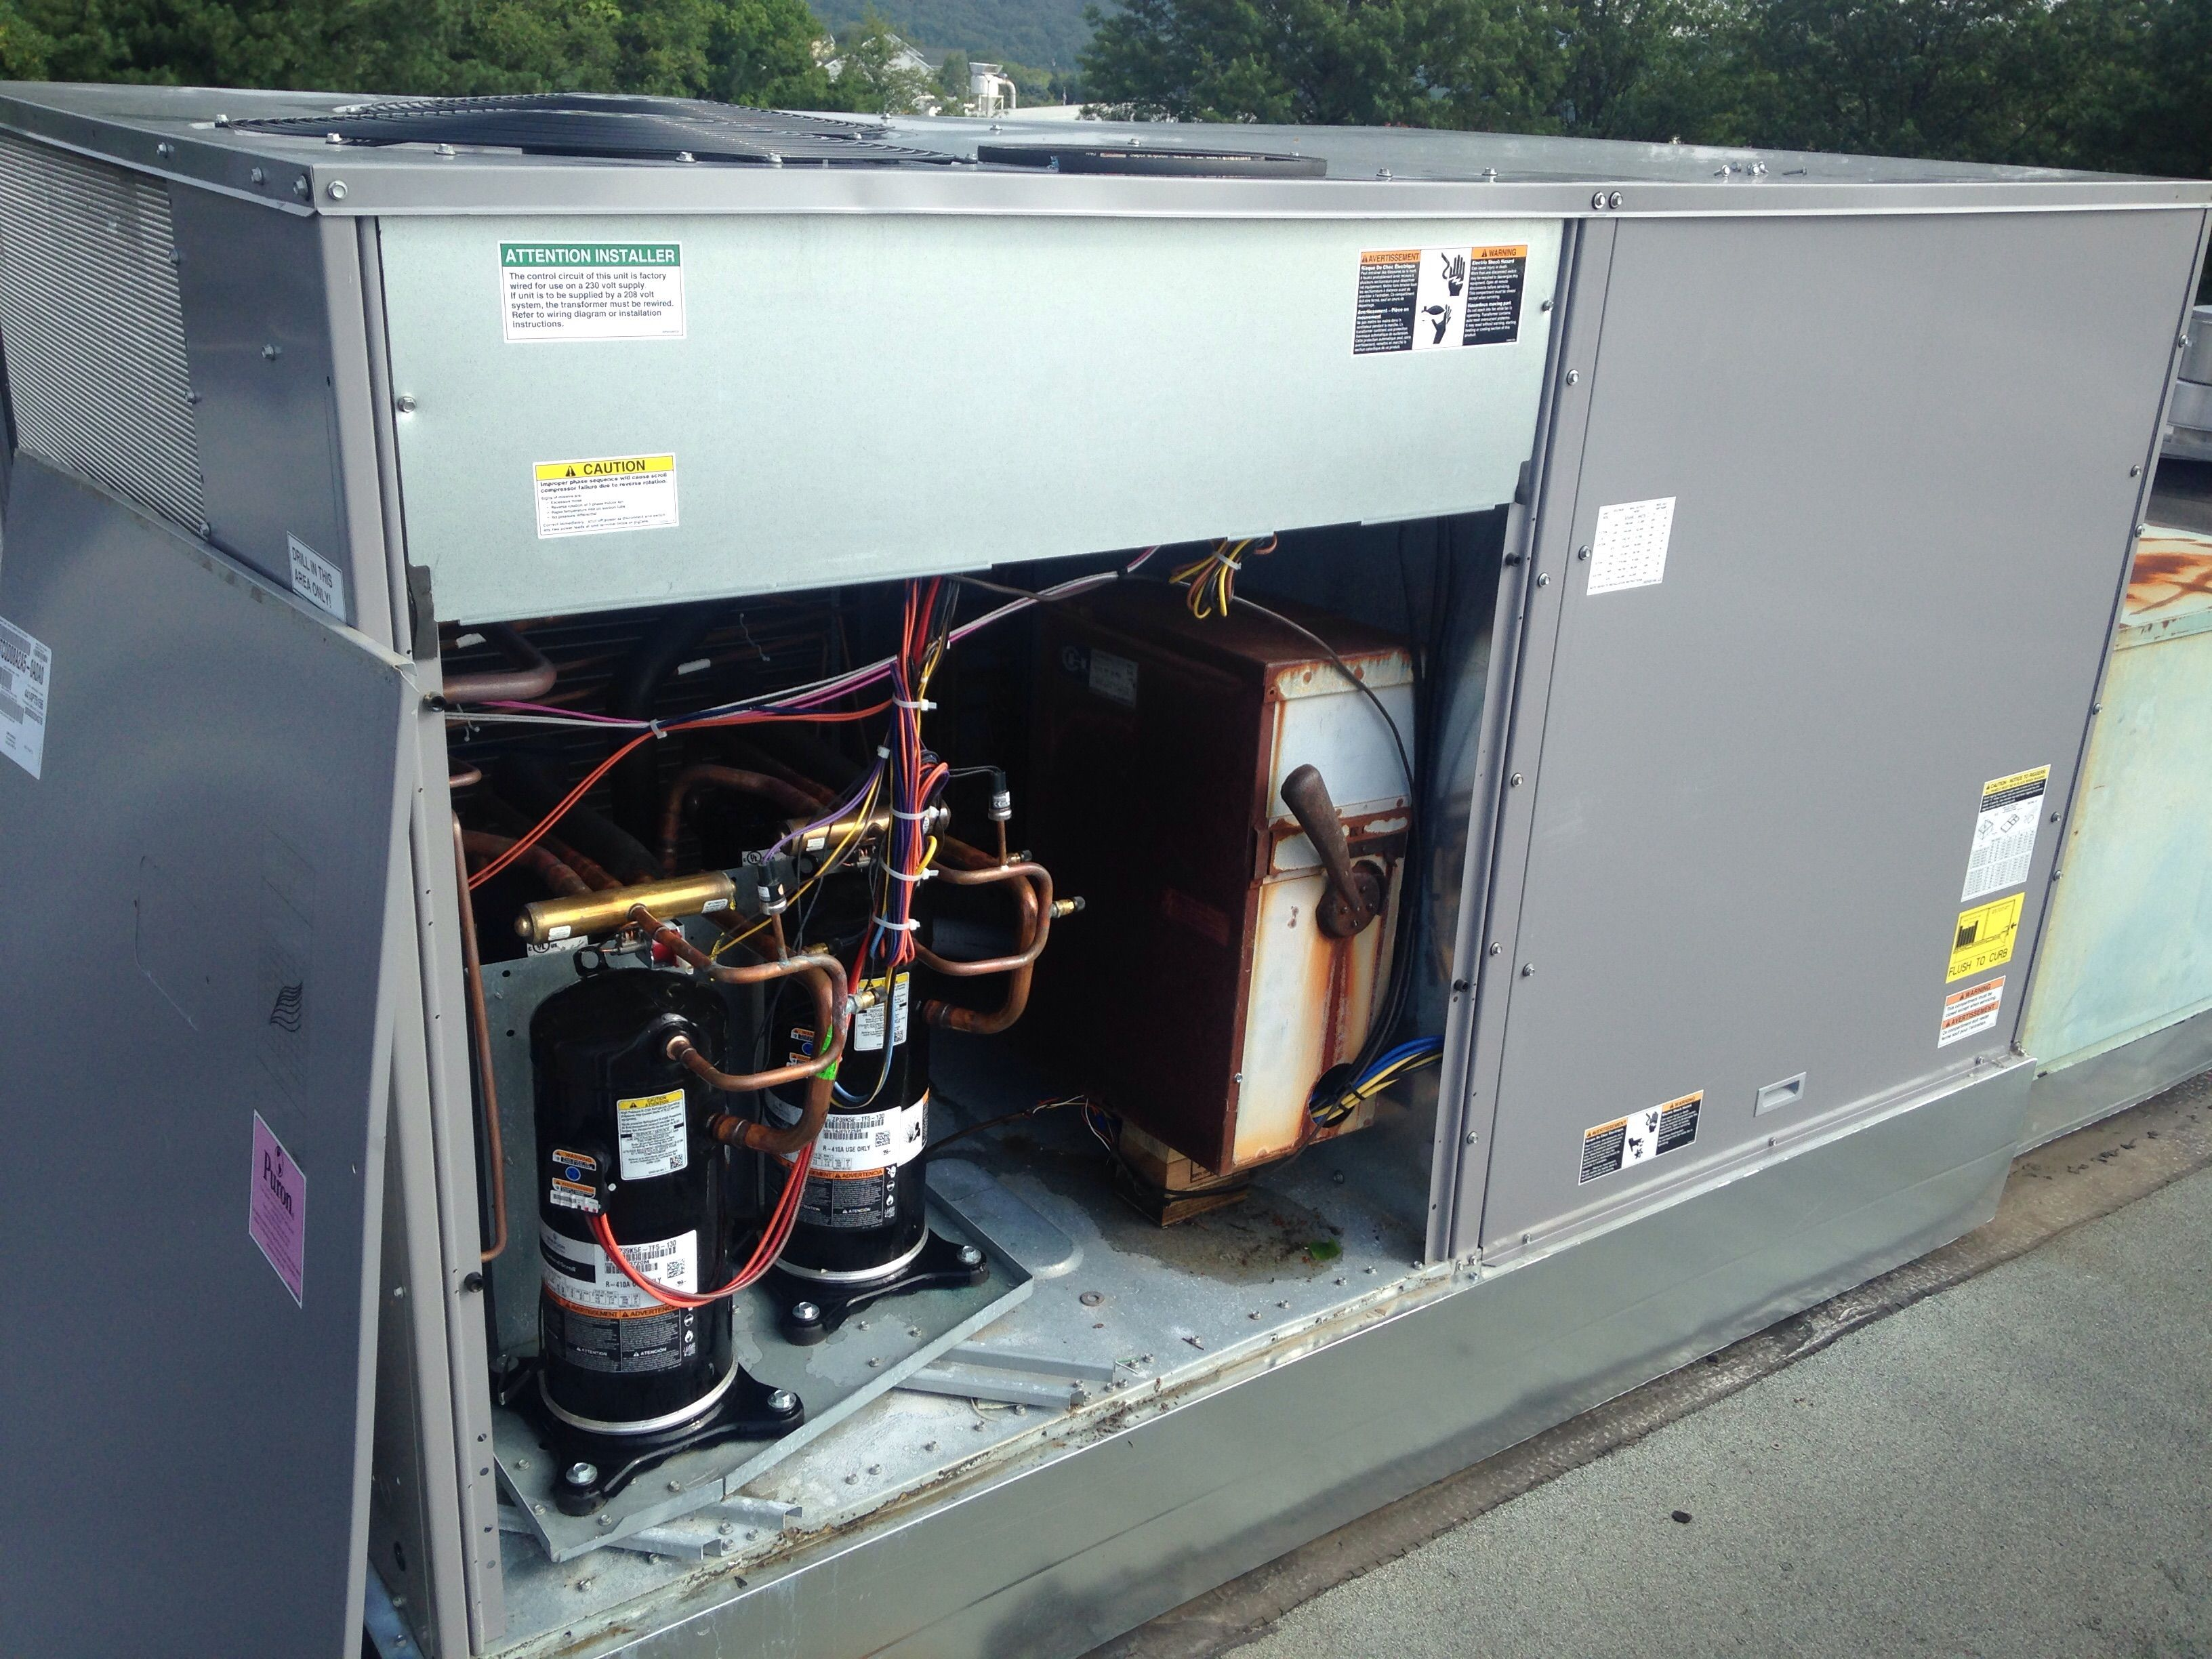 Emergency Disconnect Hvac Hacks Com Hvac Hacks Hvac Heating And Air Conditioning